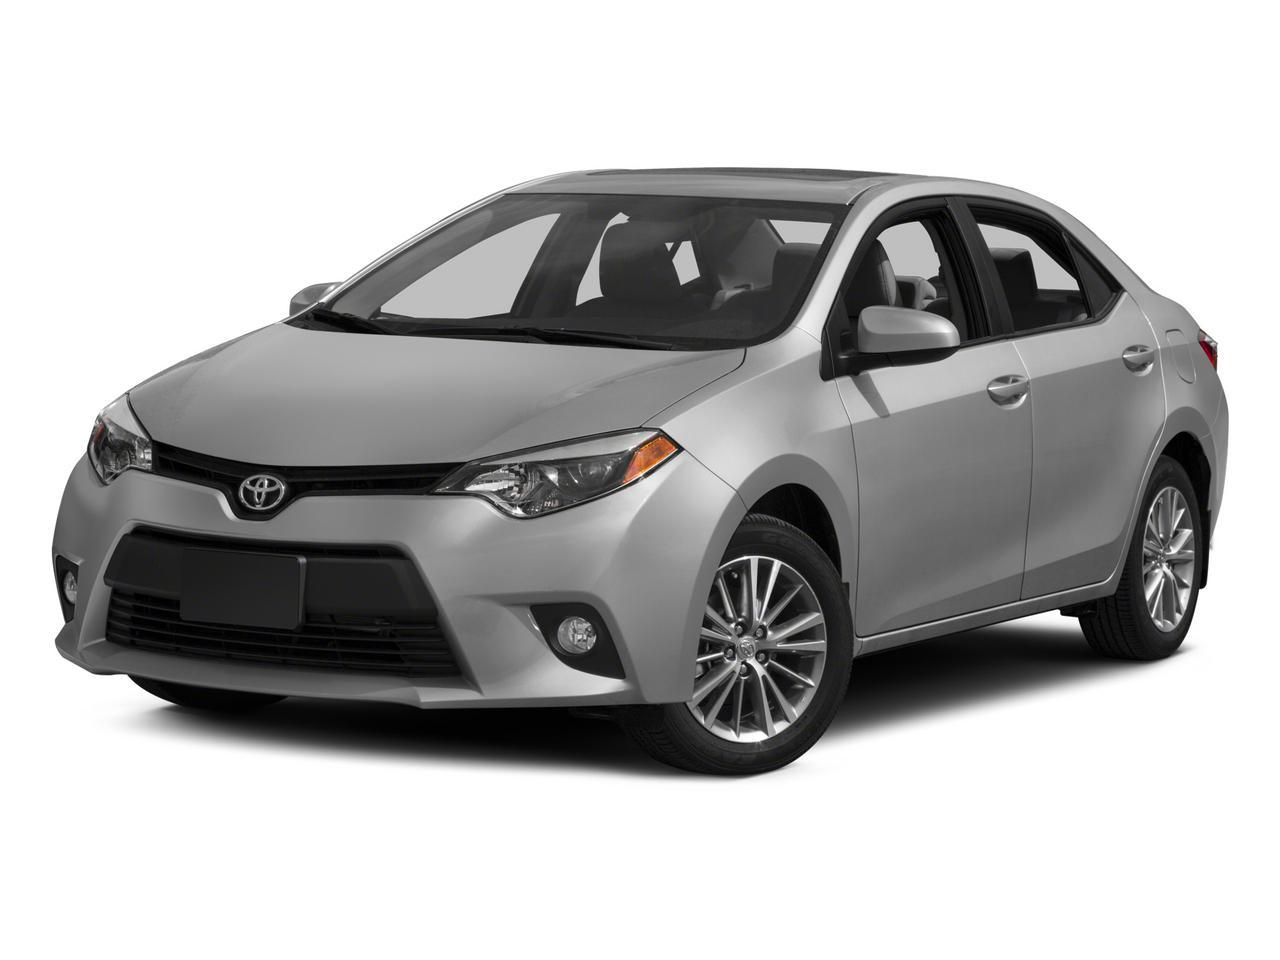 2015 Toyota Corolla Vehicle Photo in Richmond, TX 77469